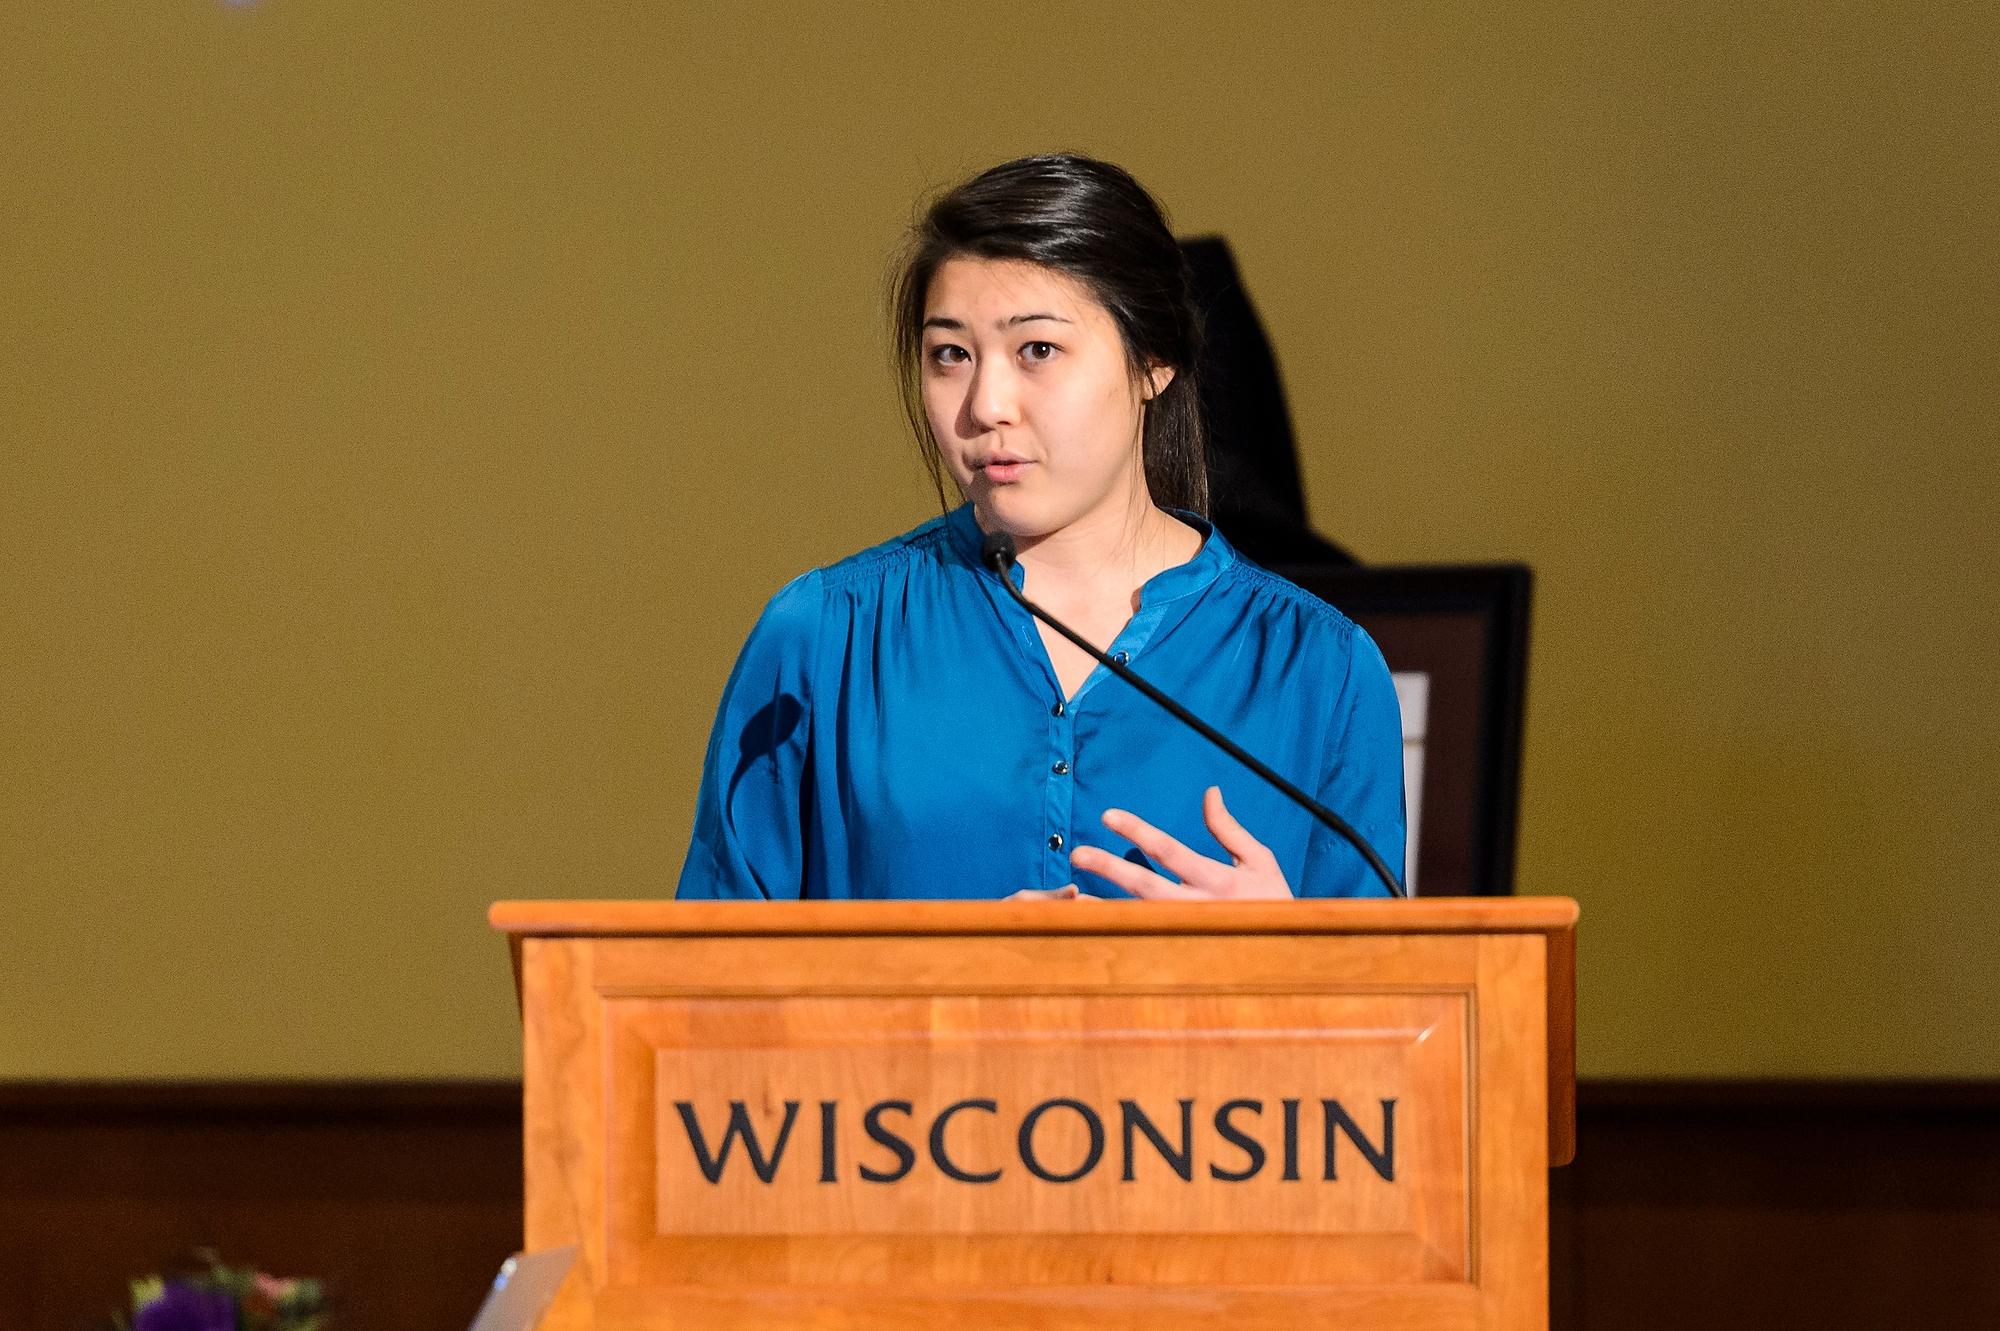 Spotlighted UW-Madison student Isabel Markowski